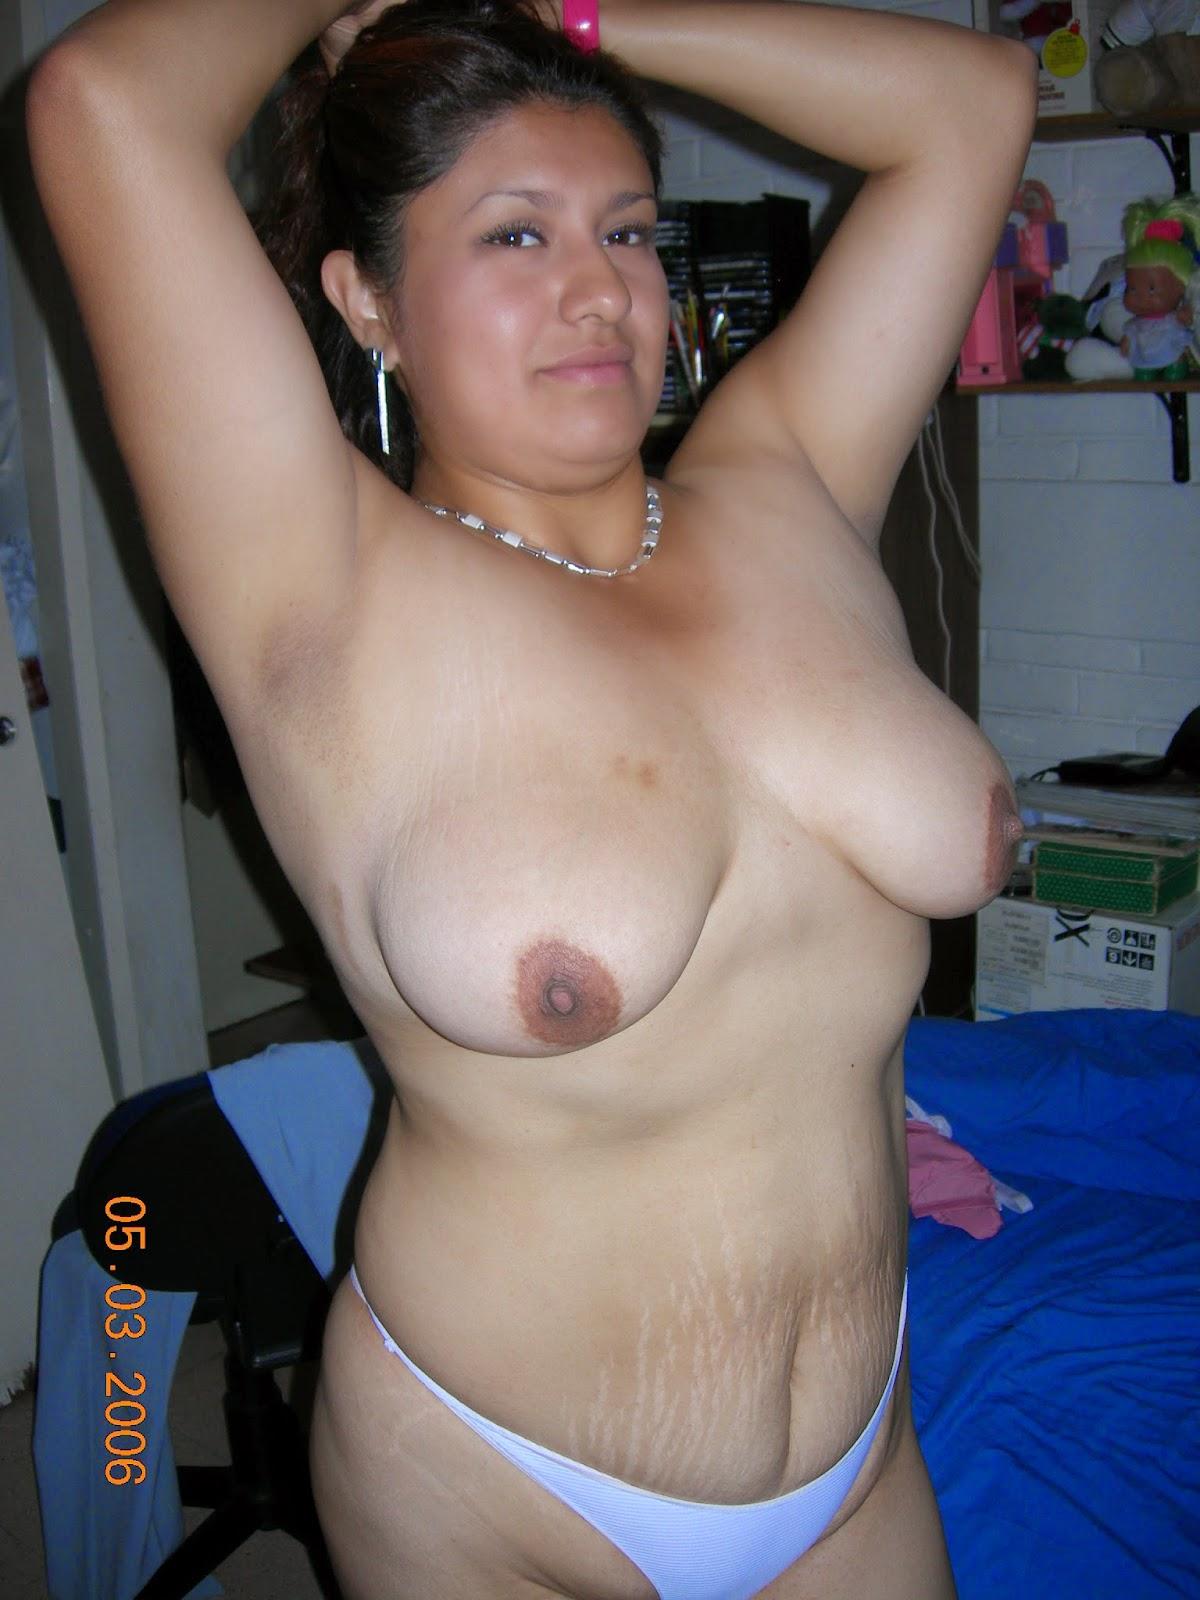 Chica caliente coño putas sensuales